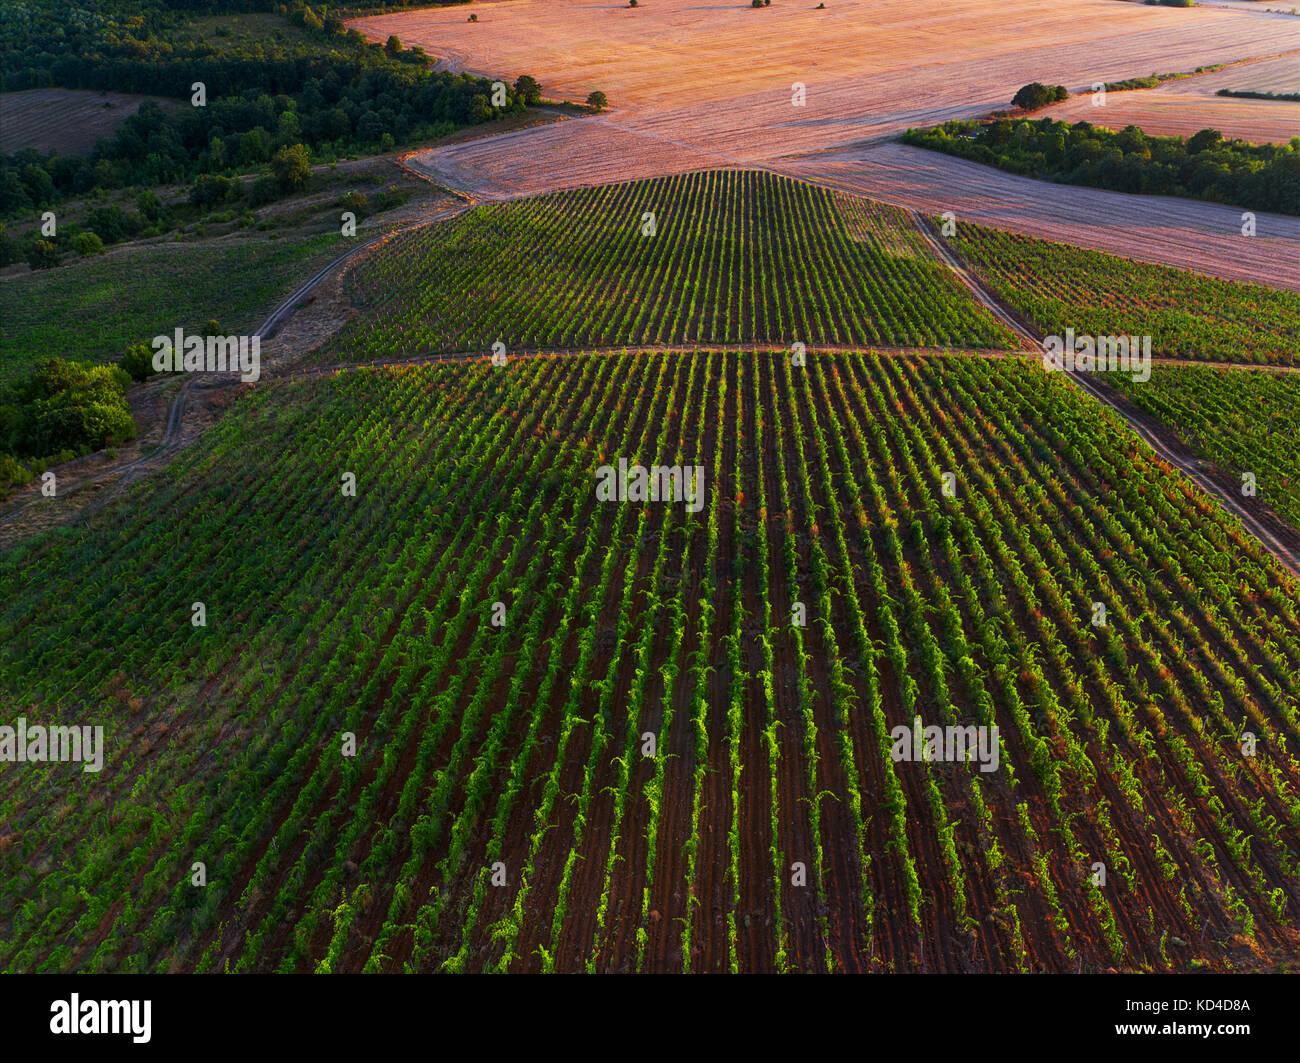 Veduta aerea vigneto in Europa. Foto Stock